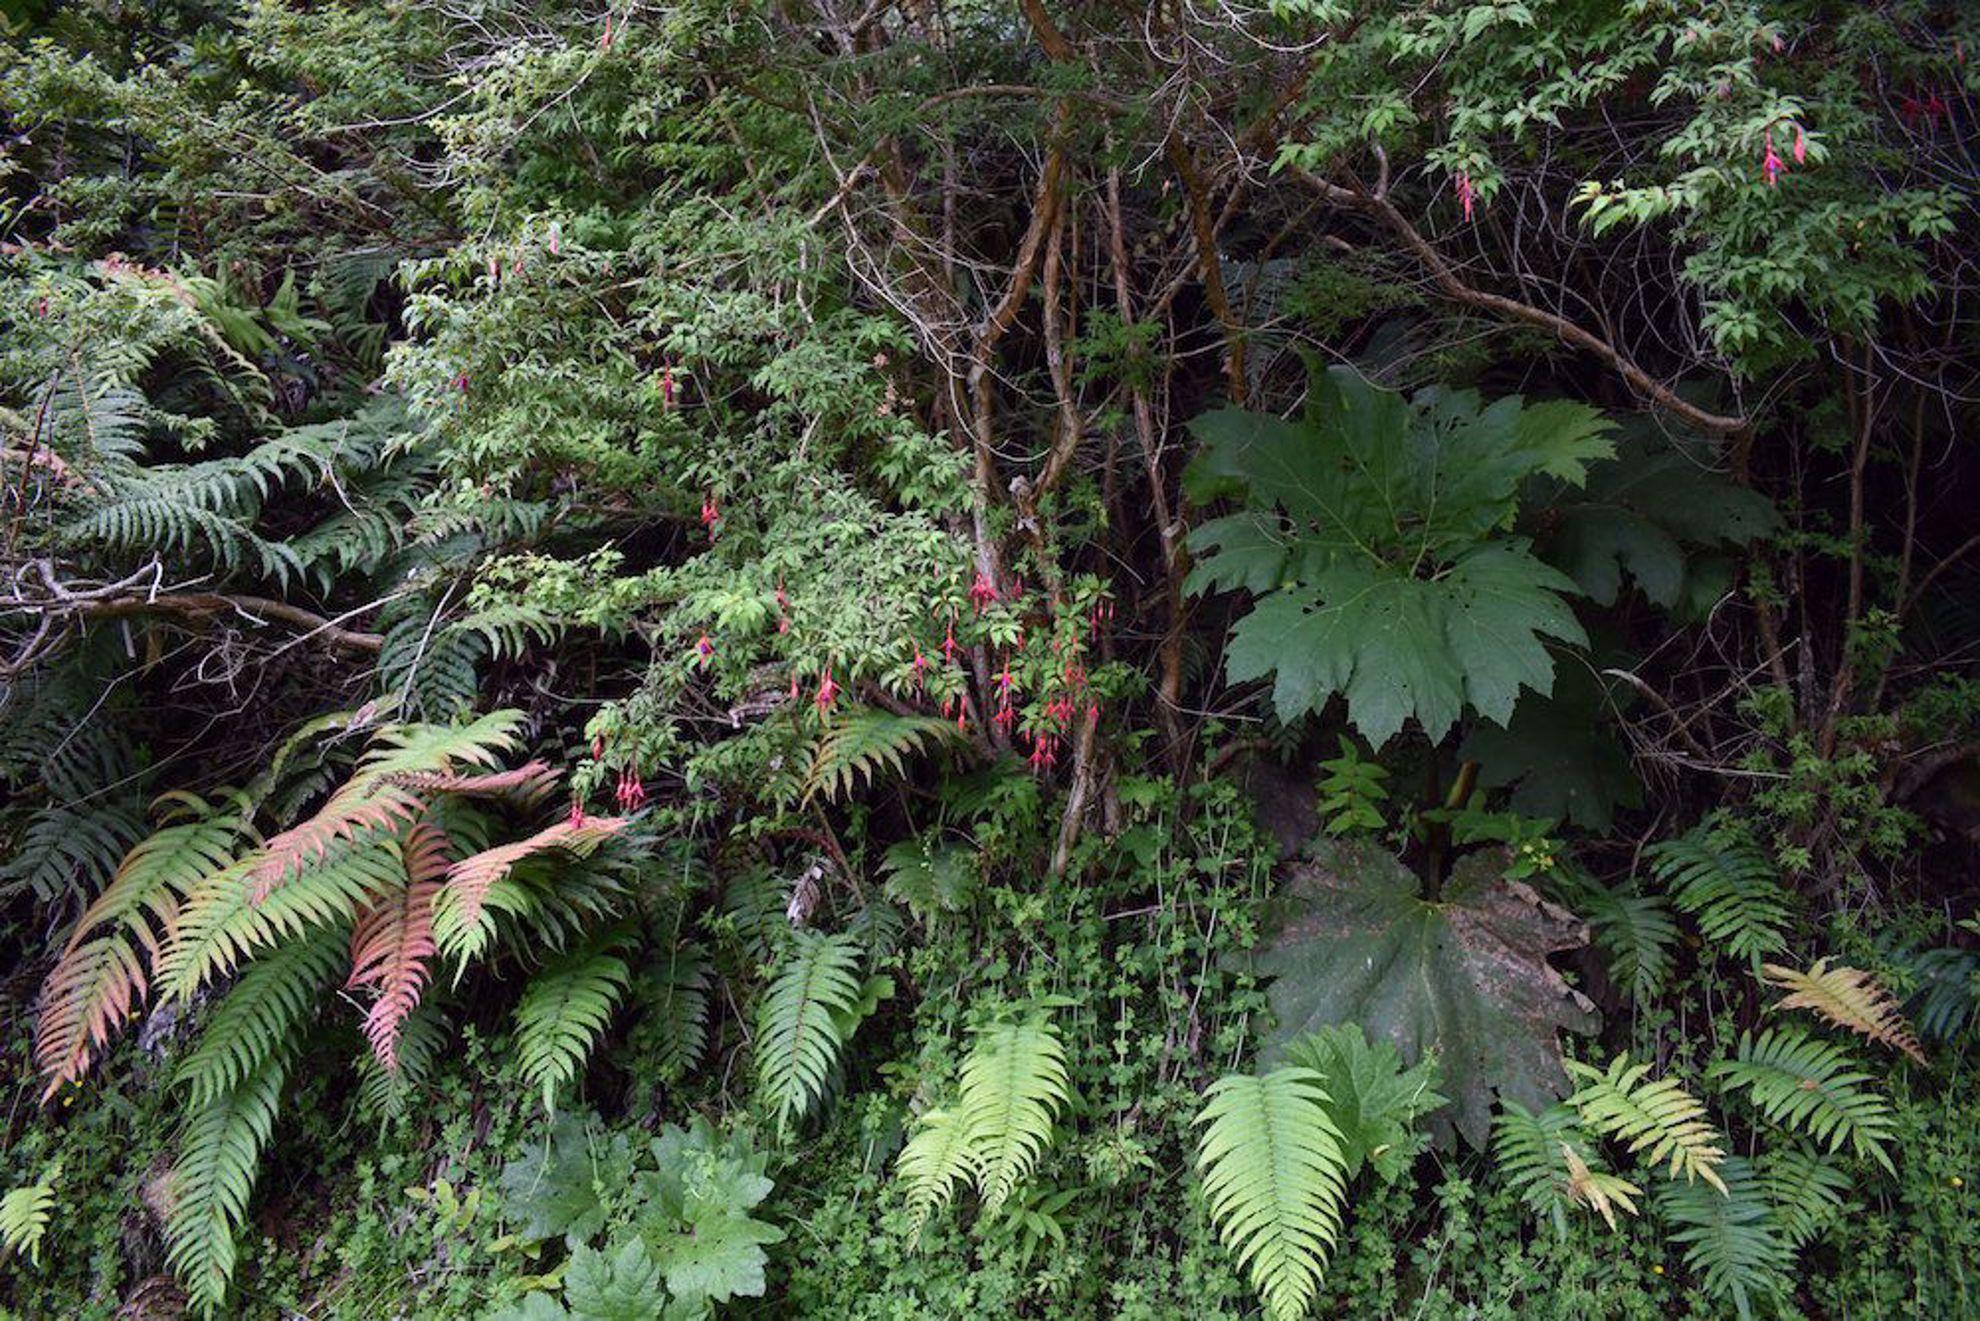 Leafy forest near Lago Ranco, Chile